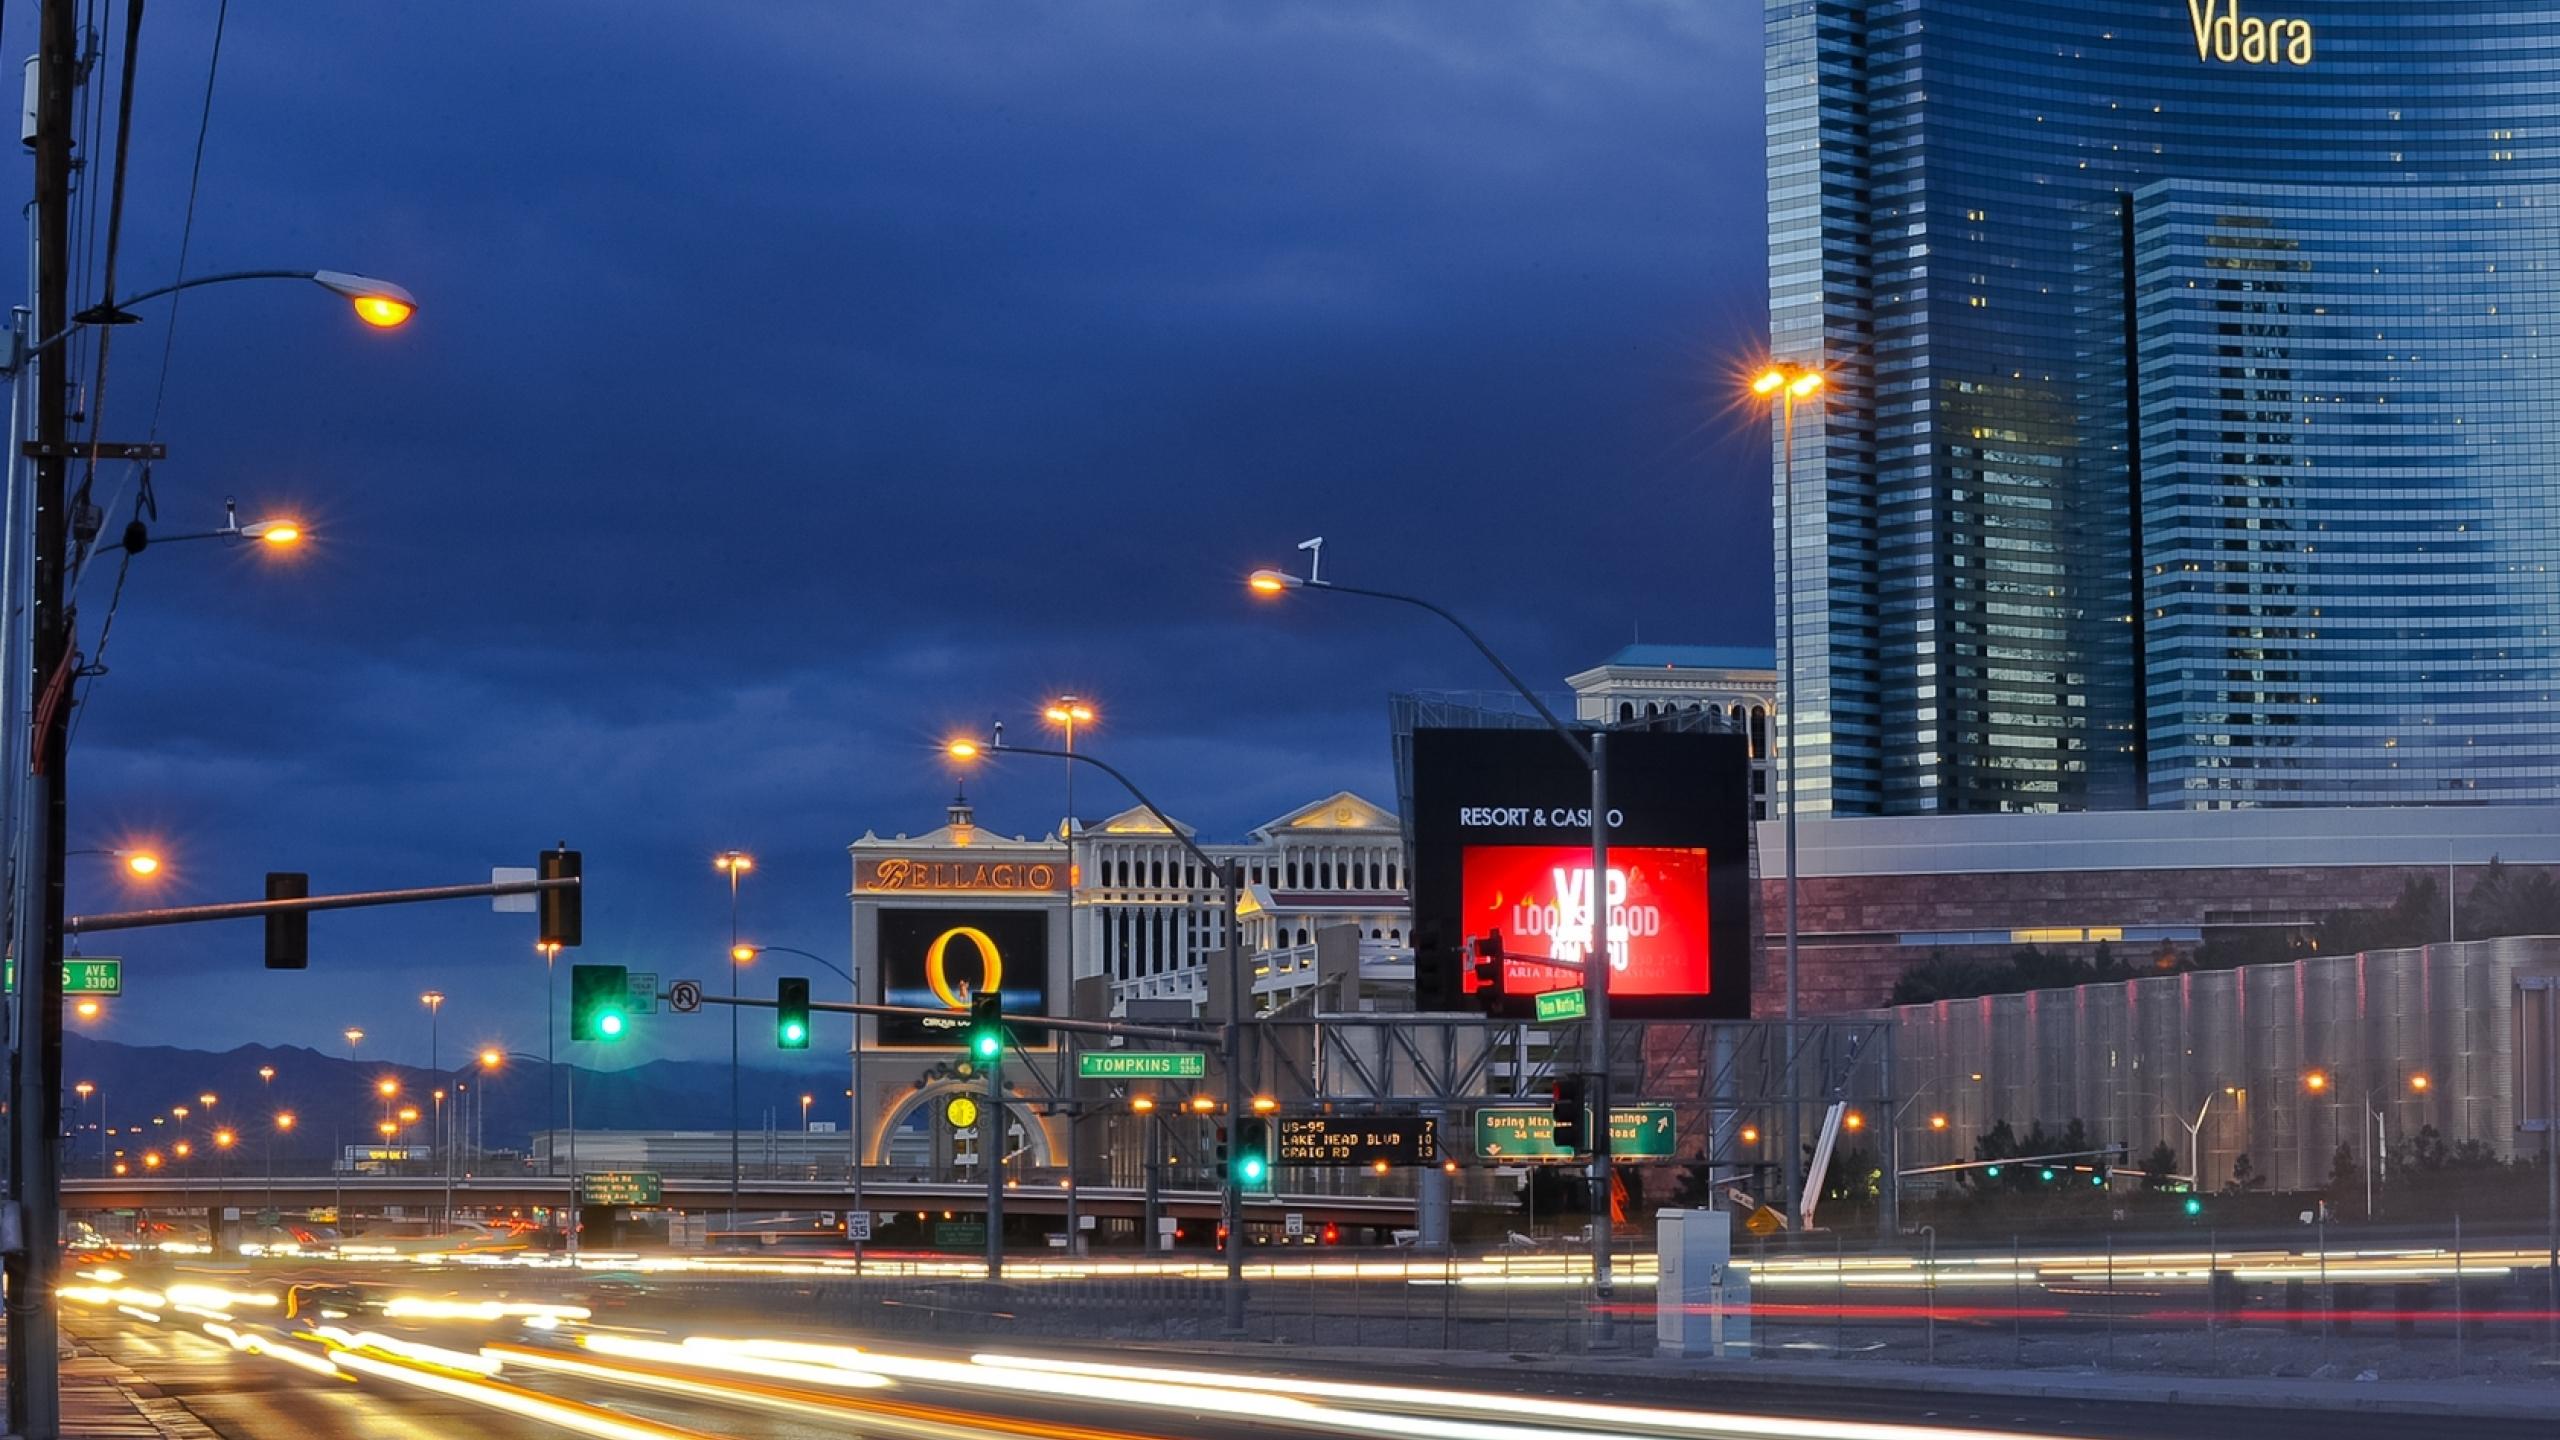 2560x1440 Las Vegas Nevada Night 1440p Resolution Wallpaper Hd